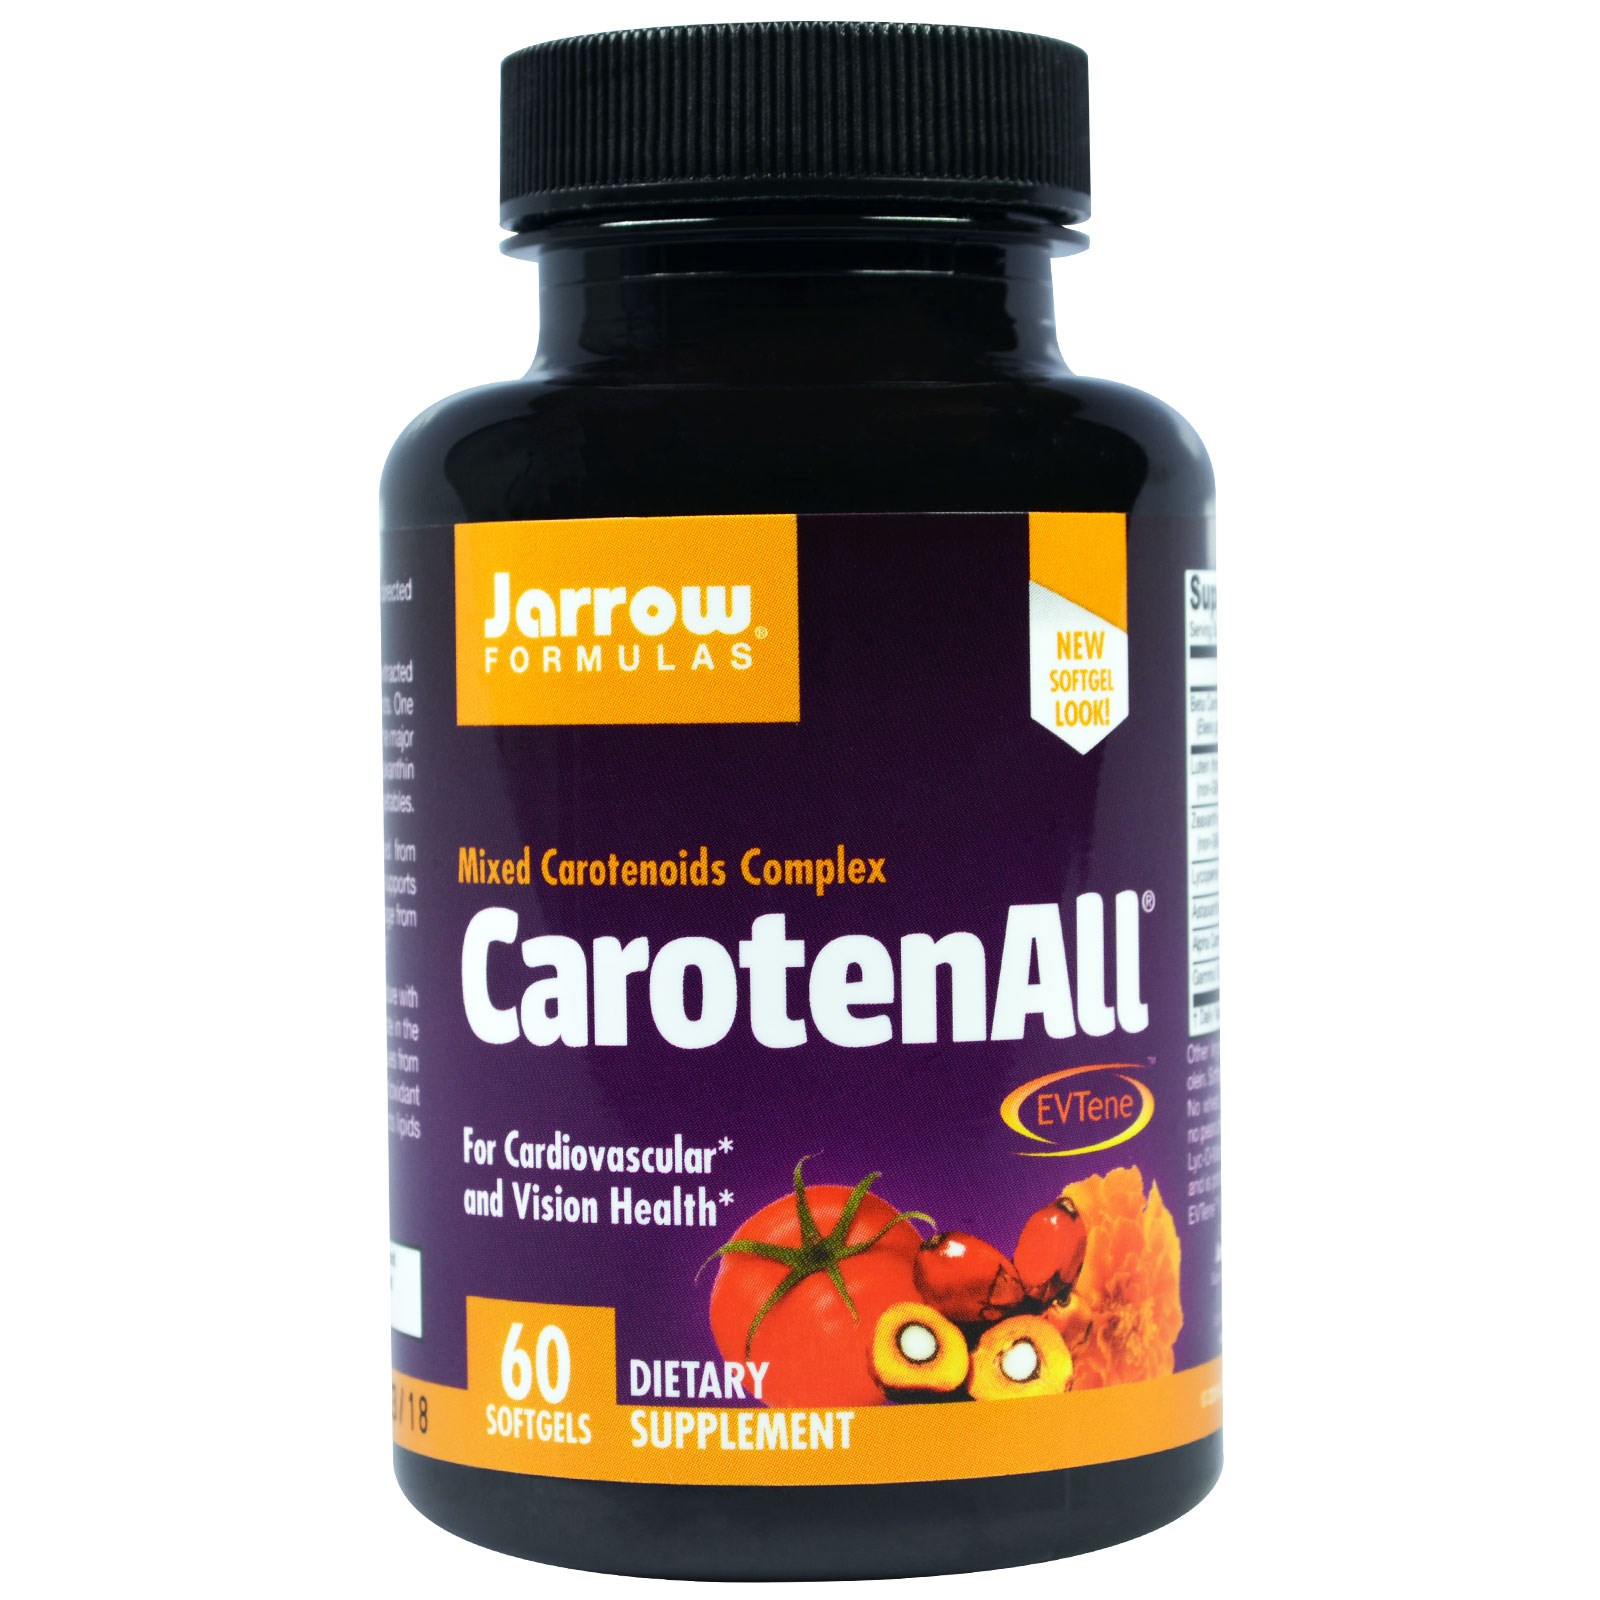 Image of CarotenALL Mixed Carotenoids Complex (60 Softgels) - Jarrow Formulas 0790011120186